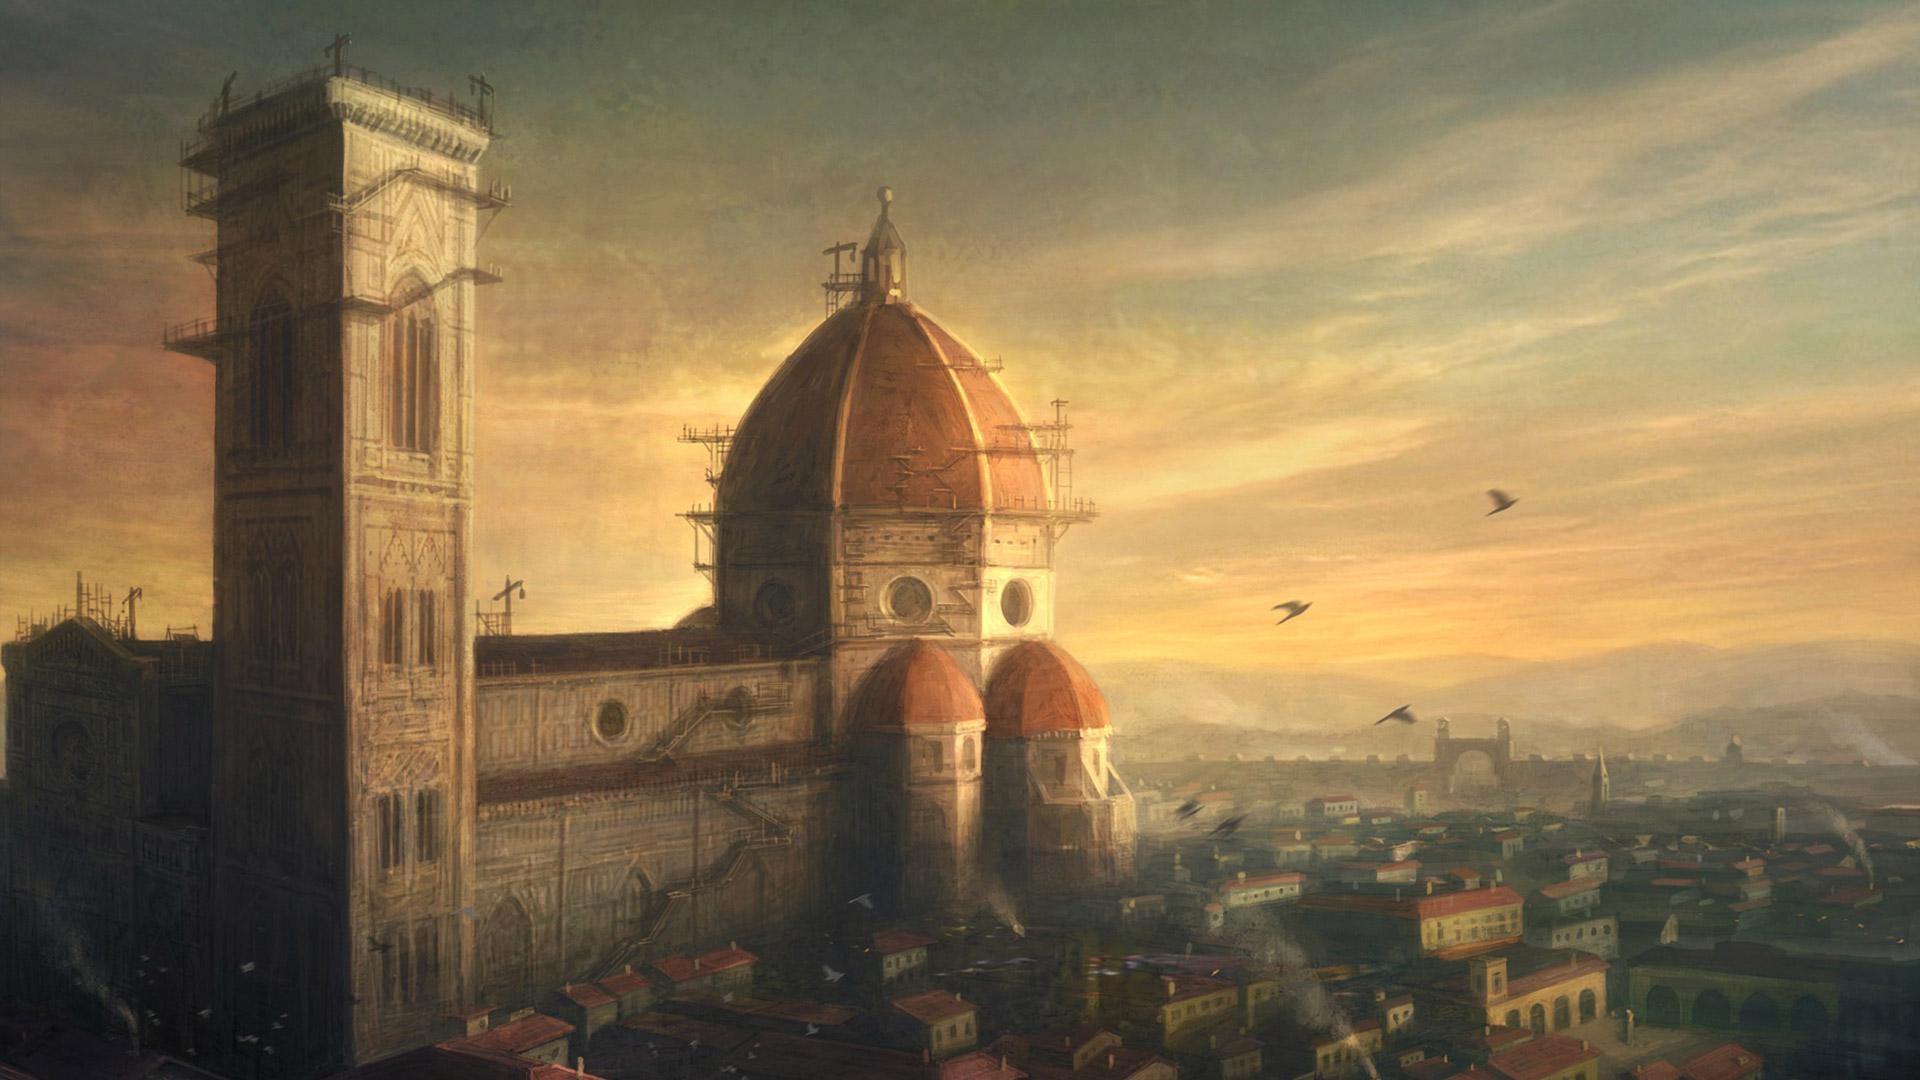 Free Assassin's Creed: Brotherhood Wallpaper in 1920x1080